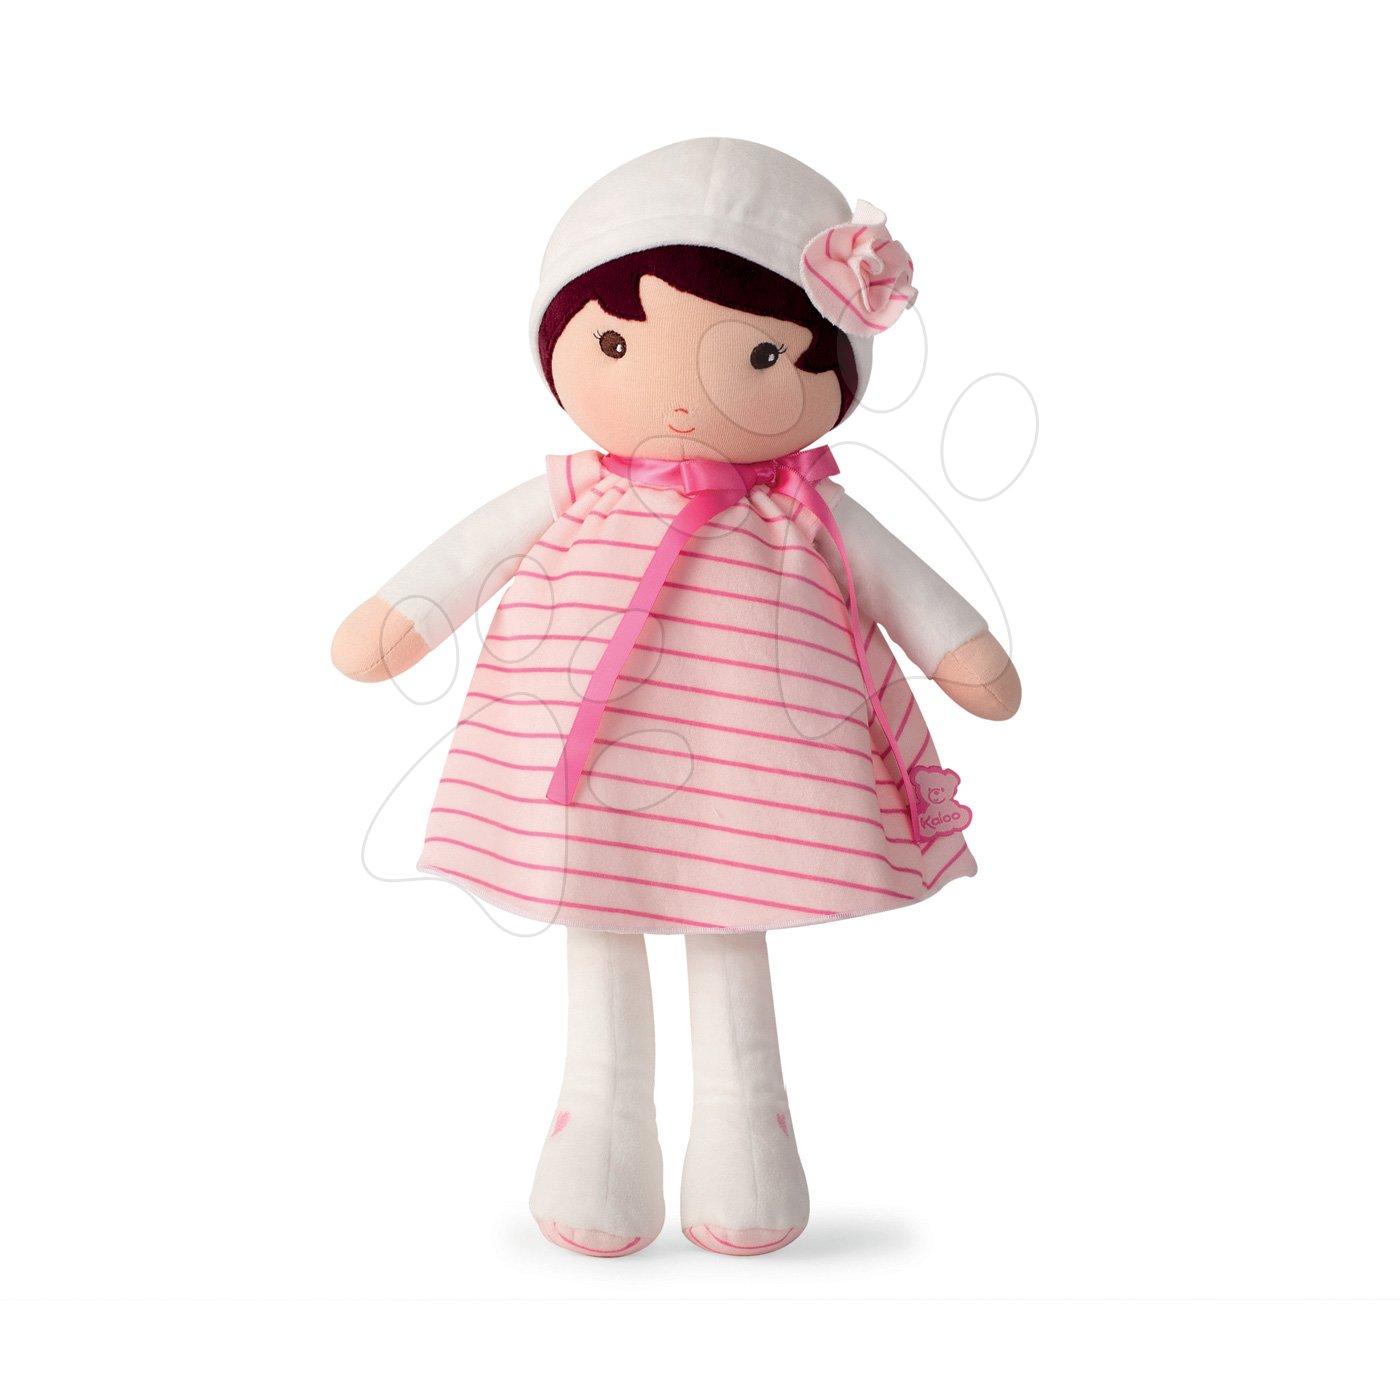 Bábika pre bábätká Rose K Tendresse Kaloo 40 cm v pásikavých šatách z jemného textilu v darčekovom balení